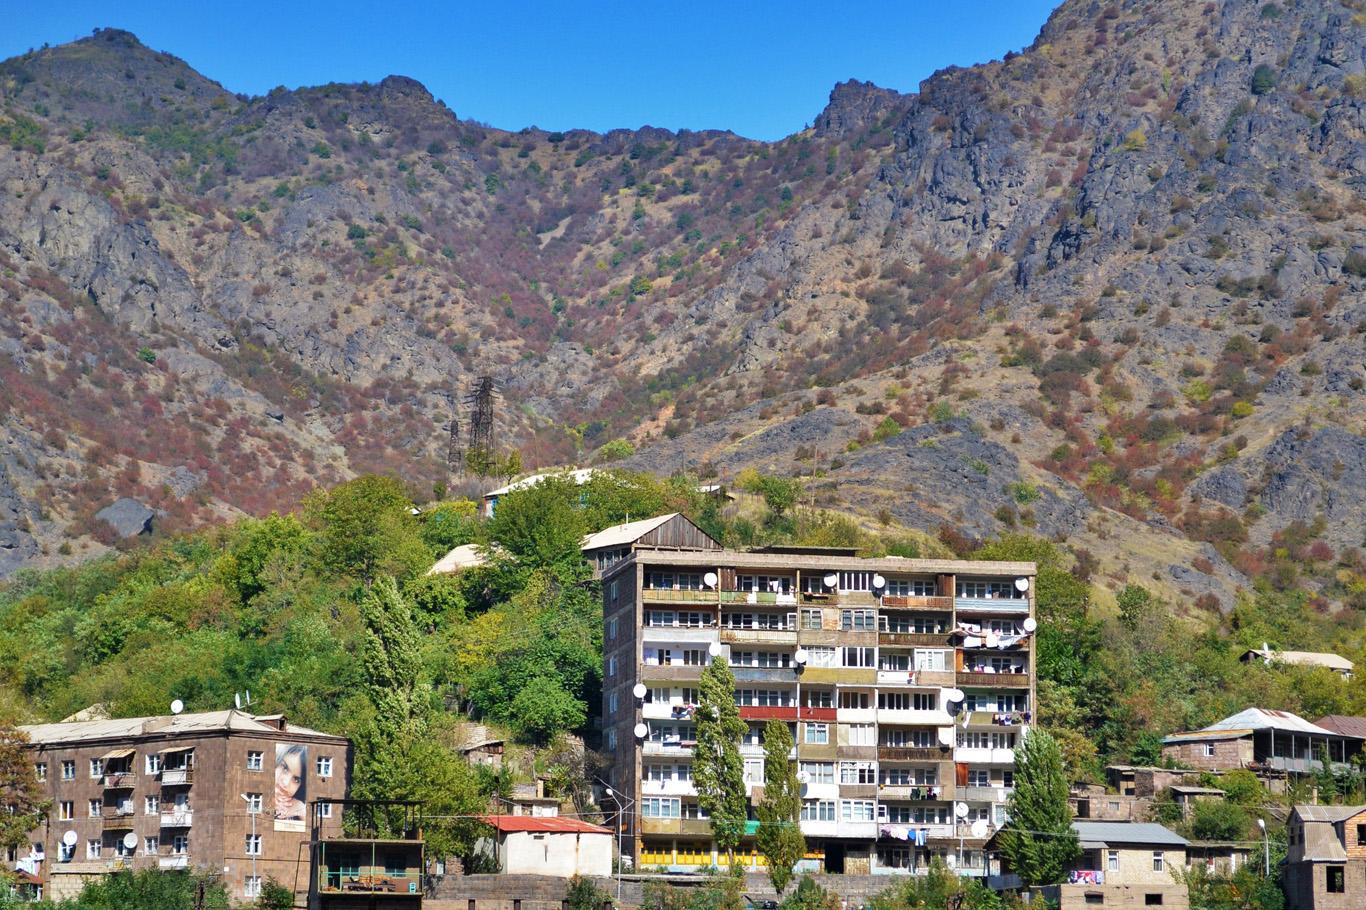 Soviet era apartment blocks spoil the landscape